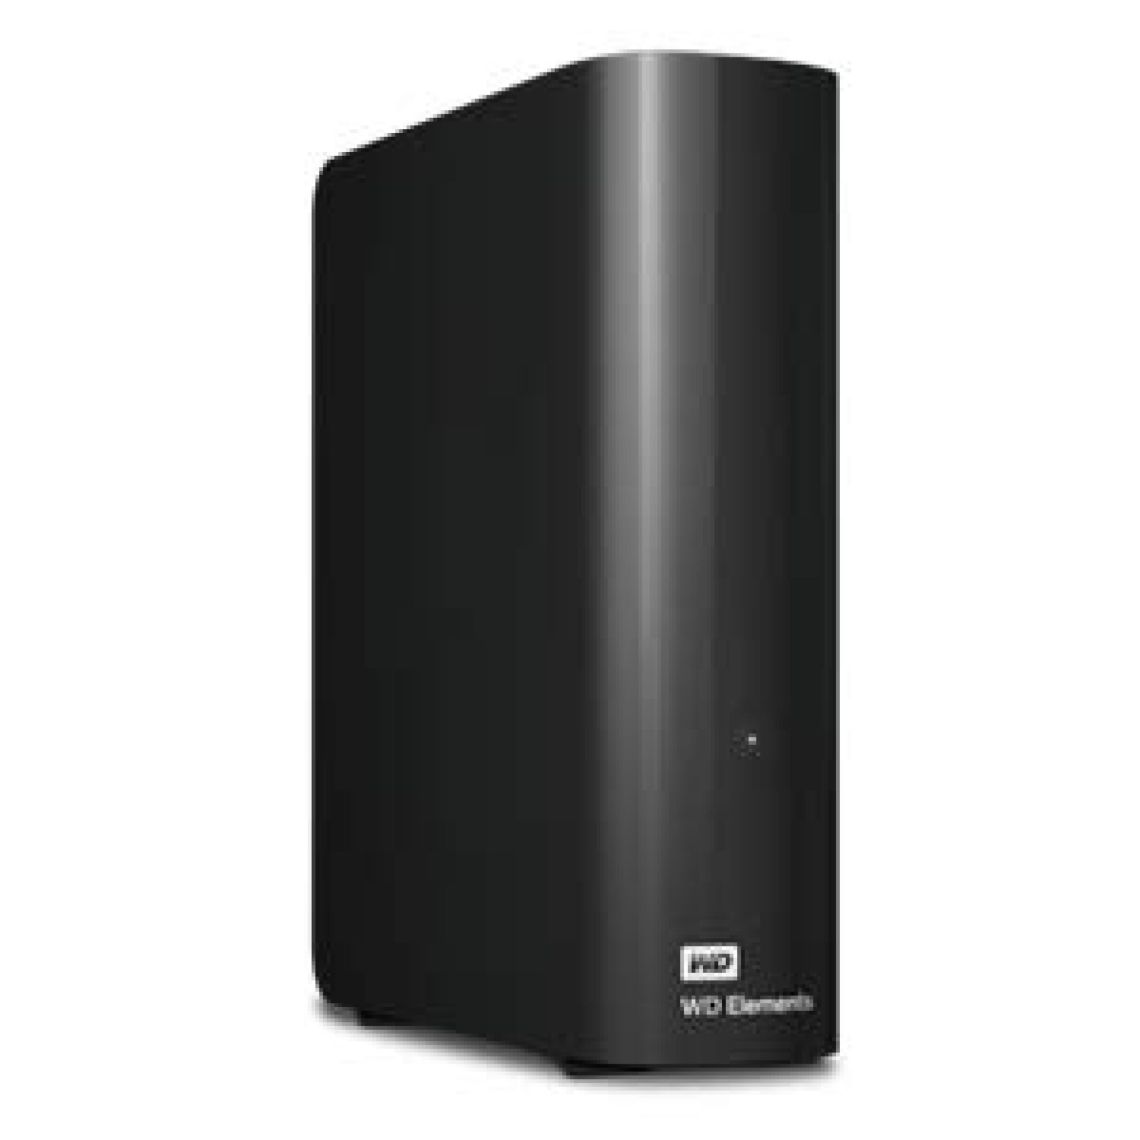 Amazon.com: WD 4TB Elements Desktop Hard Drive - USB 3.0 -WDBWLG0040HBK-NESN: Computers & Accessories